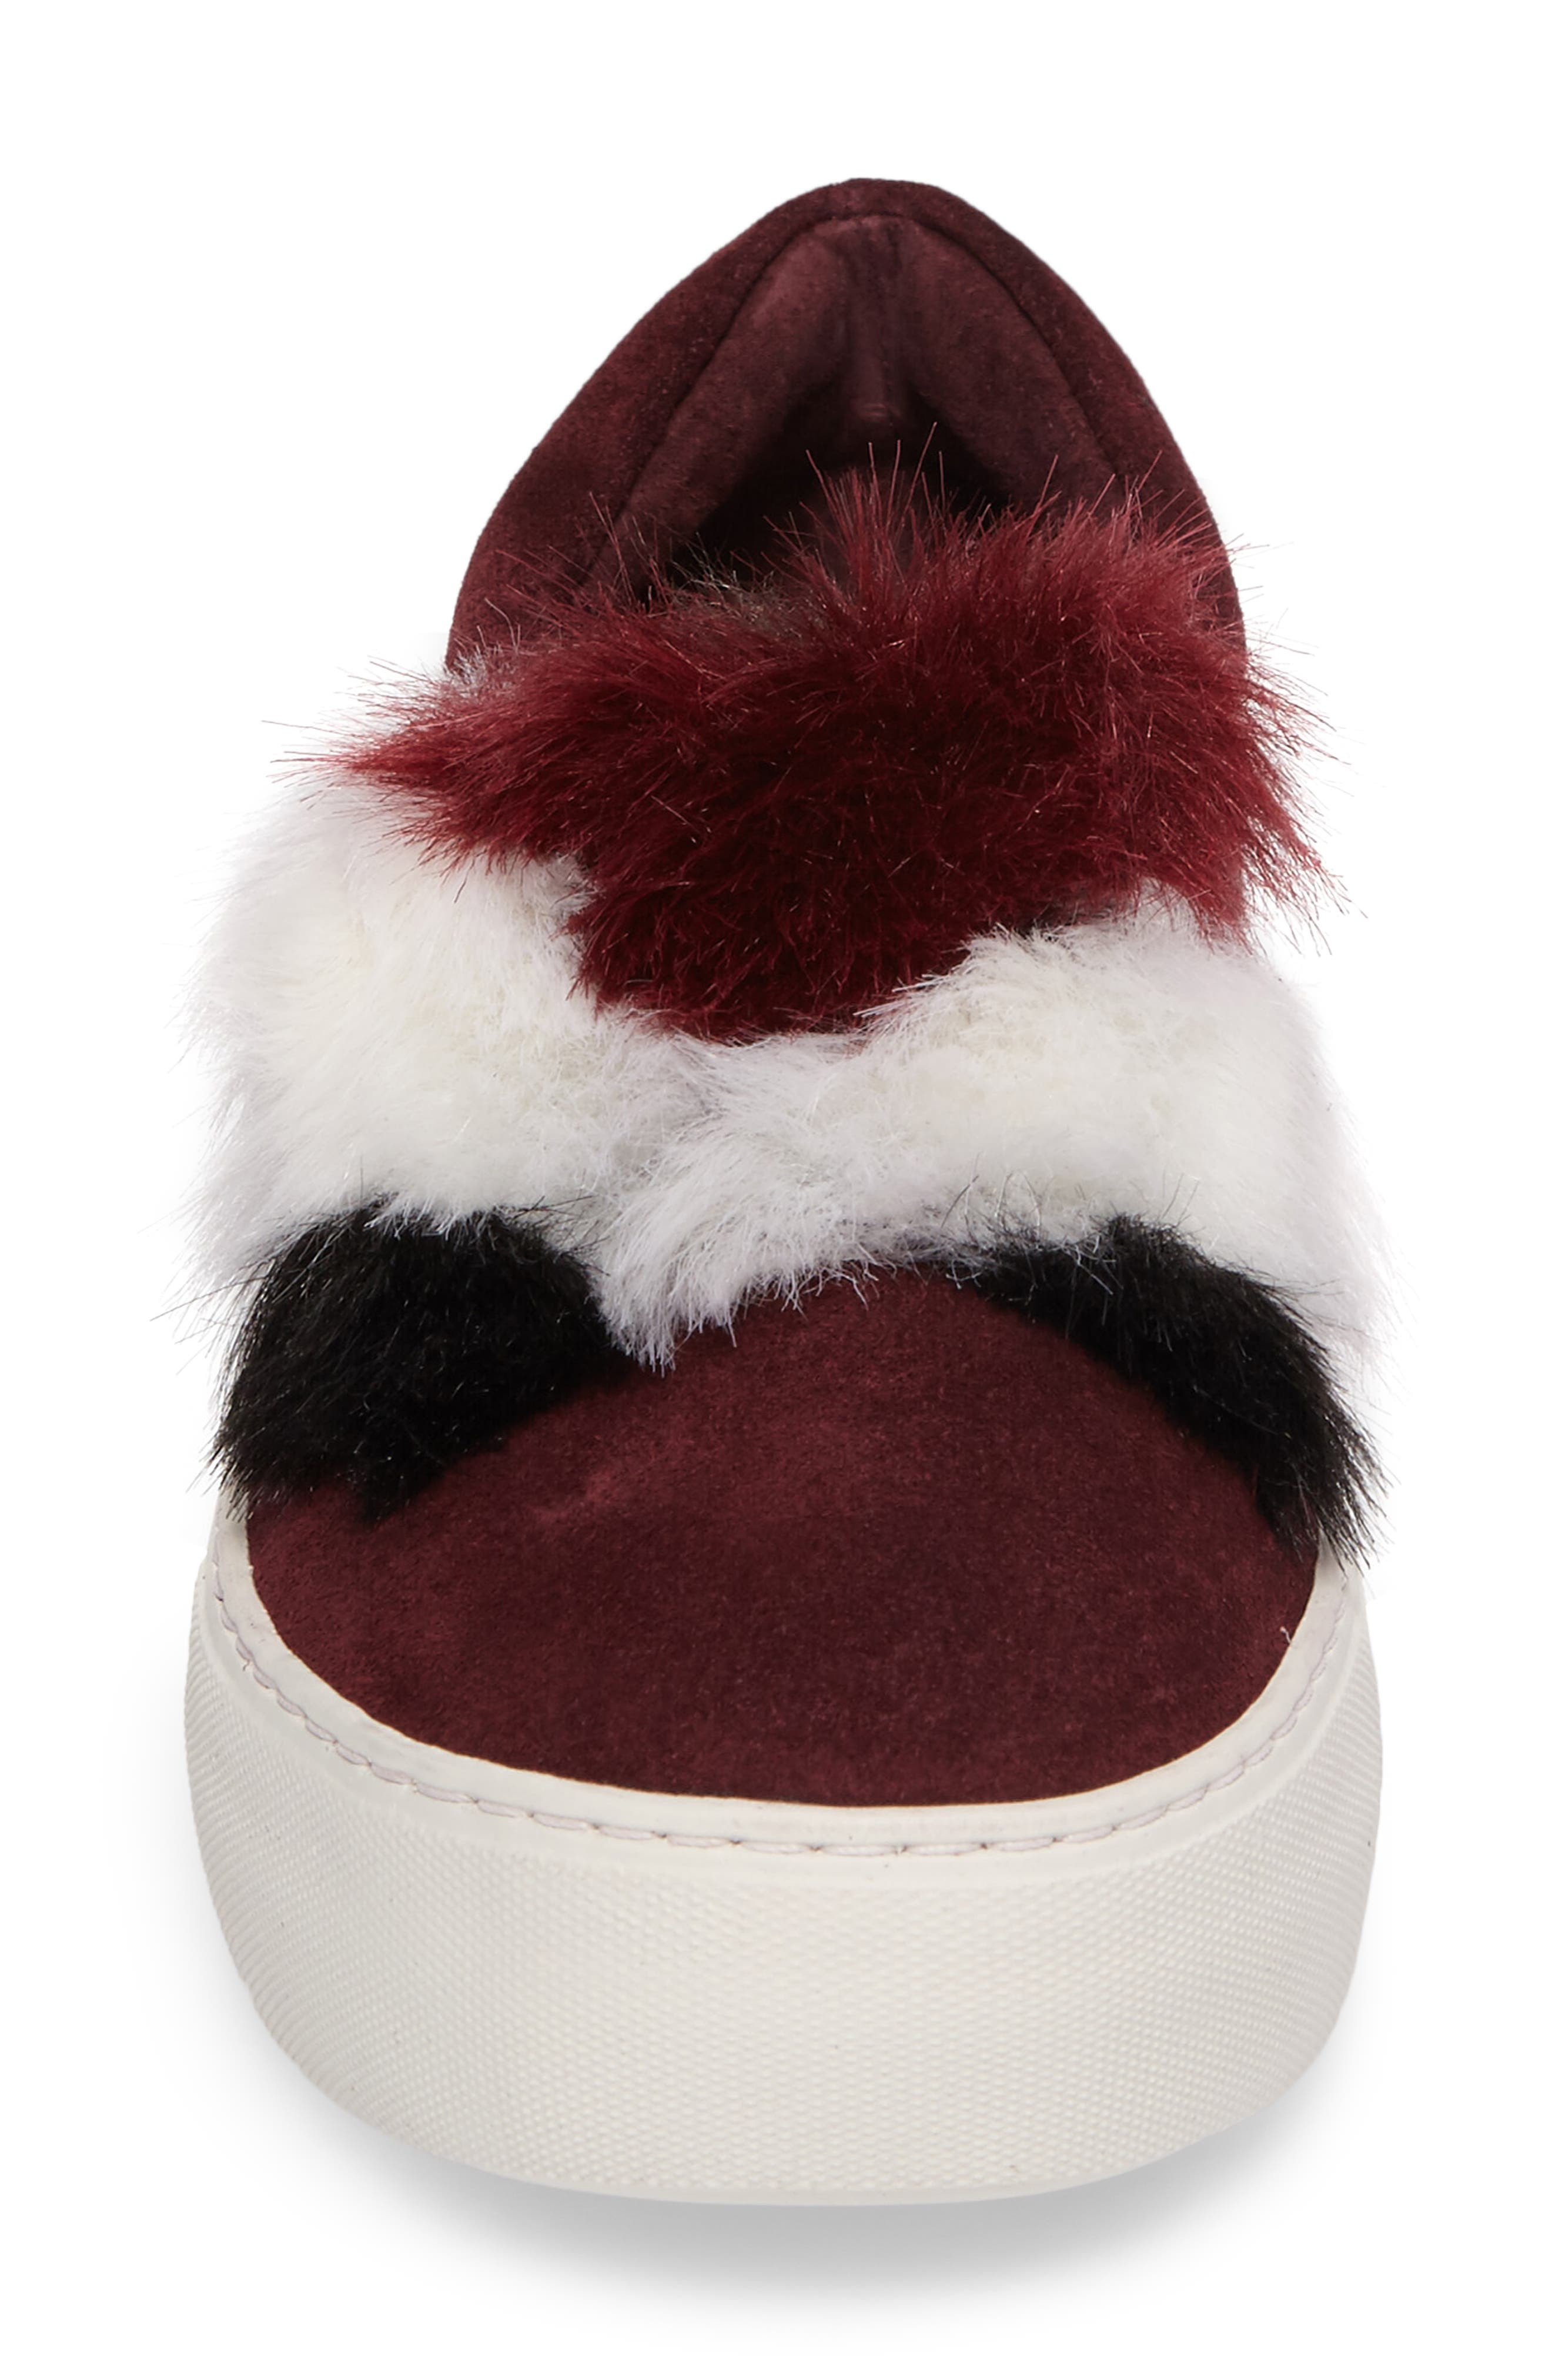 Alexi Faux Fur Slip-On Sneaker,                             Alternate thumbnail 4, color,                             Burgundy Suede